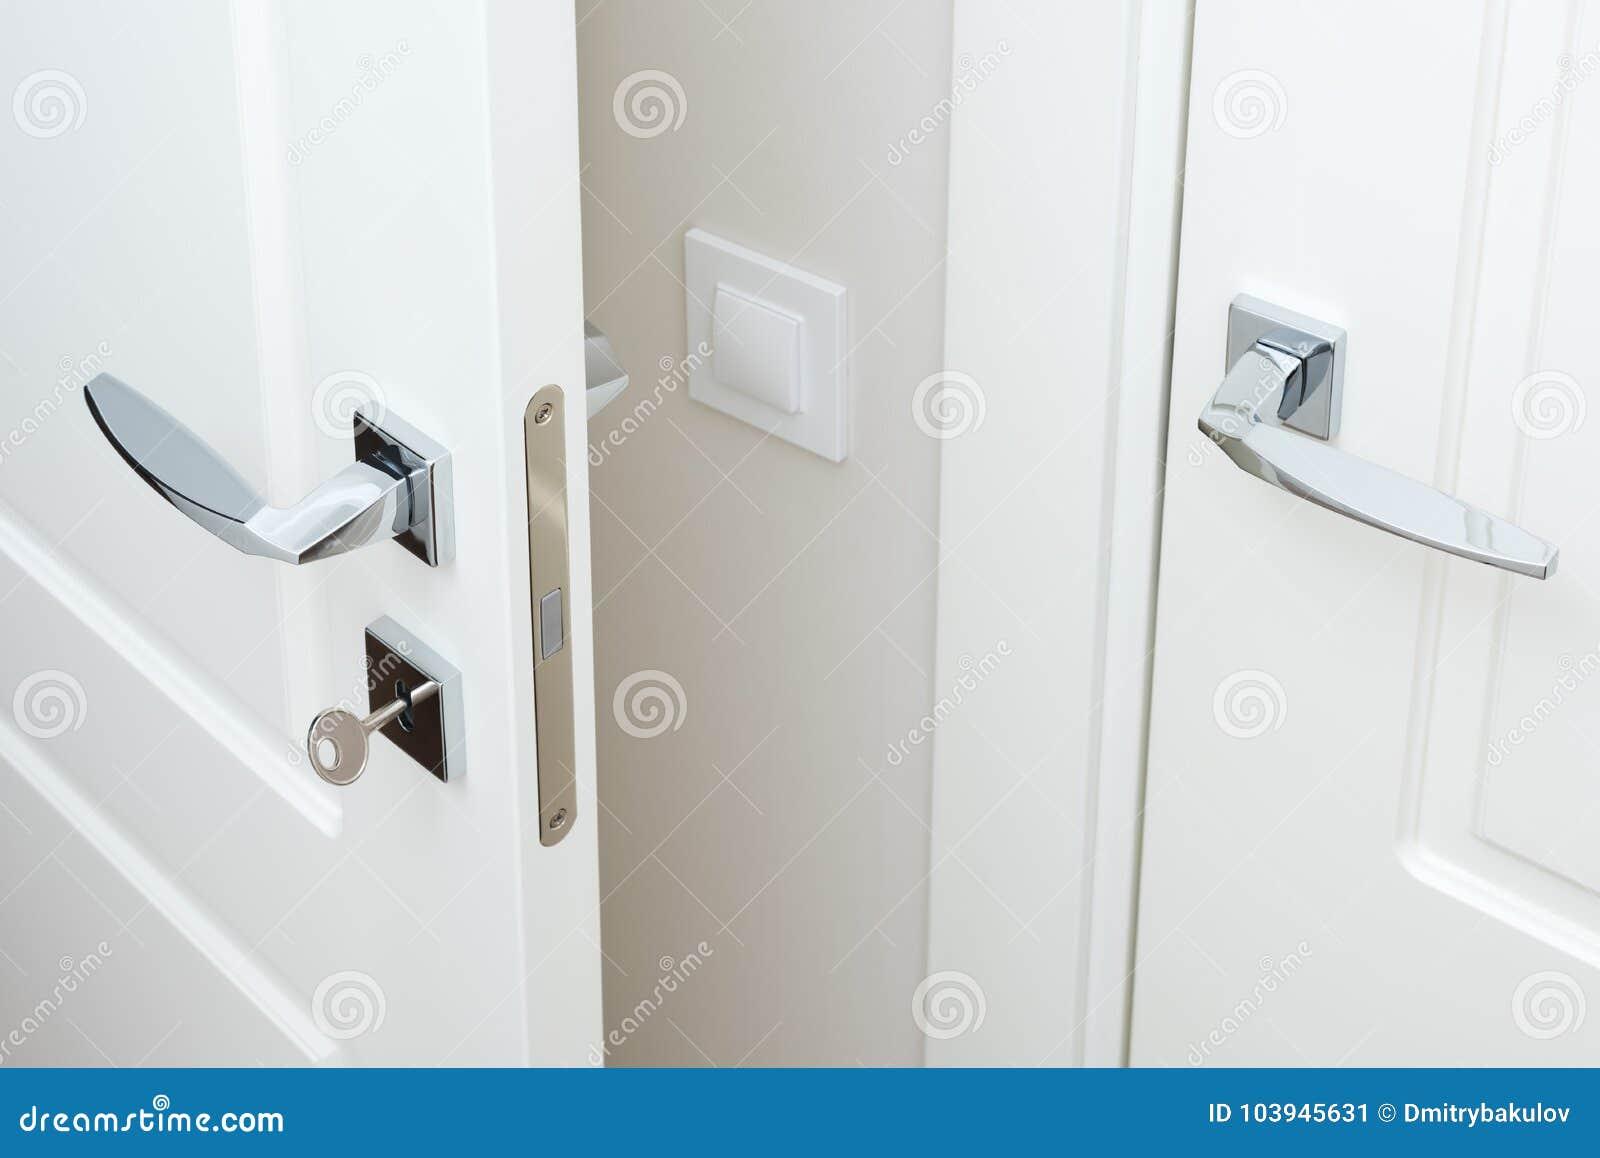 Modern Chrome Door Handle And Lock With Key White Interior Door